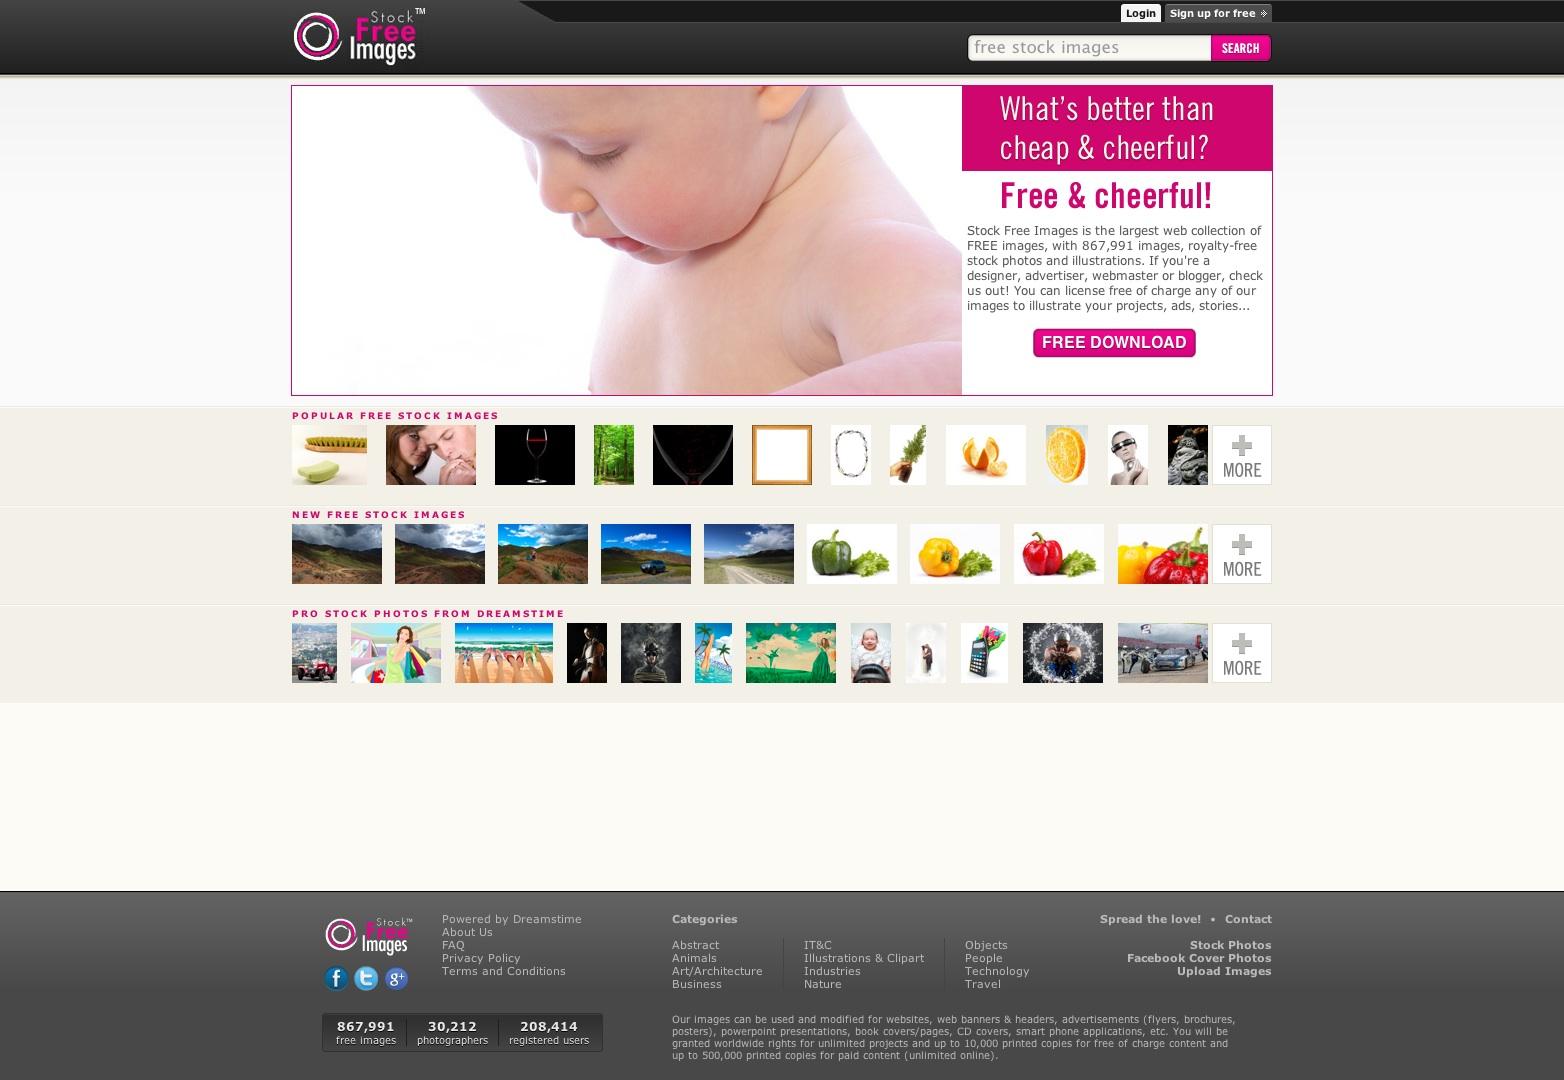 Free-Stock-Photos-Images-StockFreeImages.com.jpg